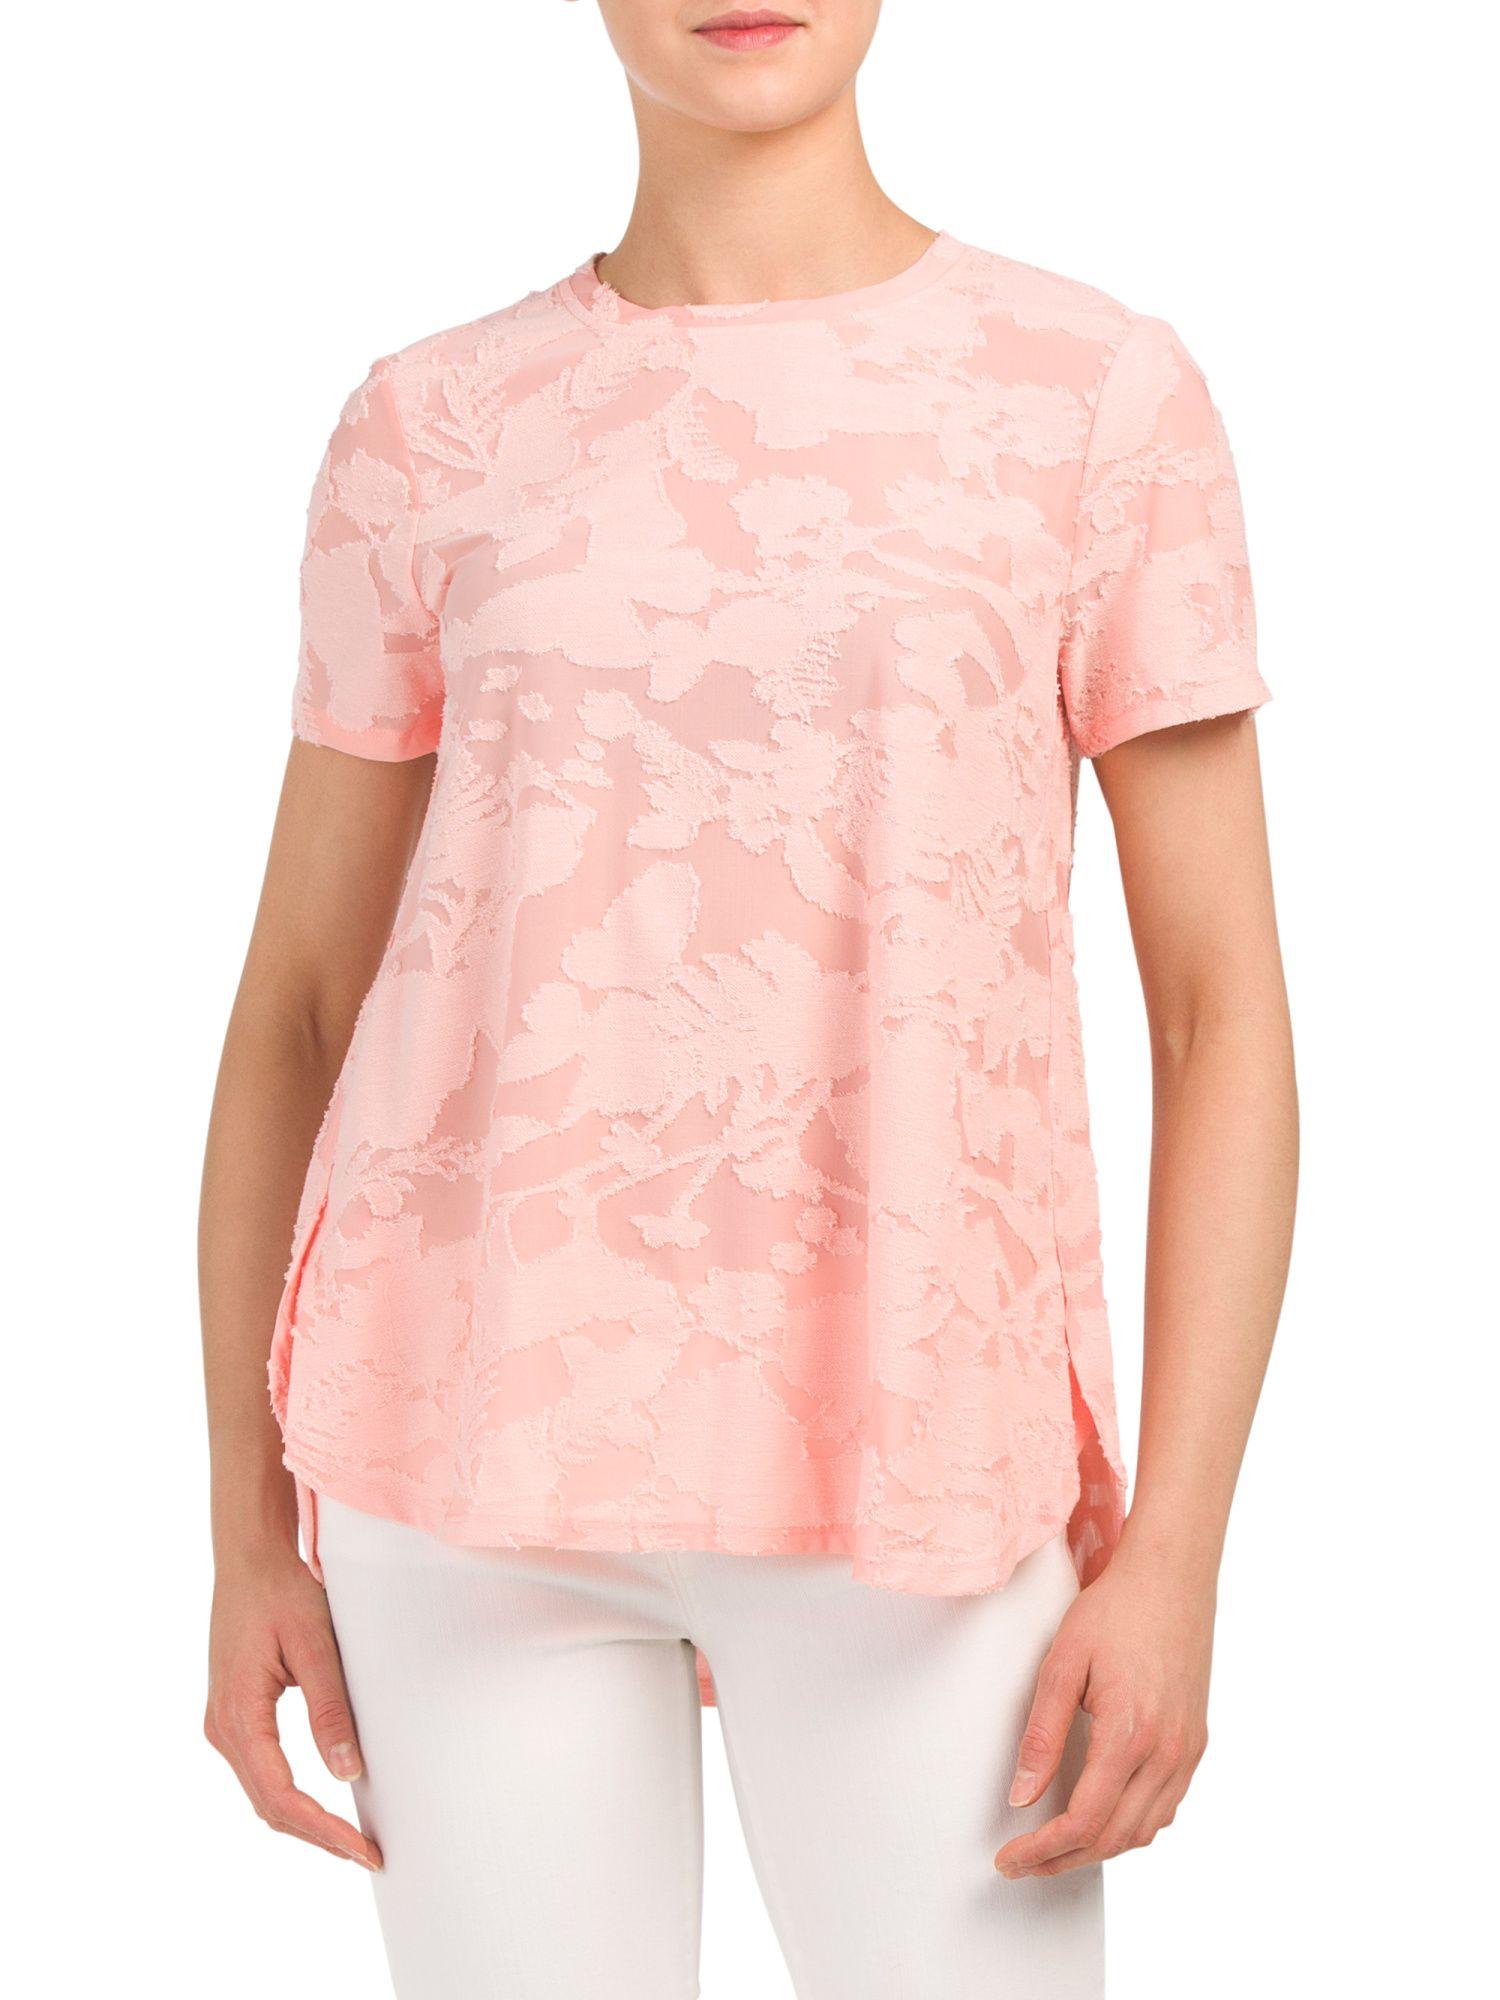 Short Sleeve High Low Shirt Tail Hem Top Shirt Tail Hem Shirt Tail High Low Shirt